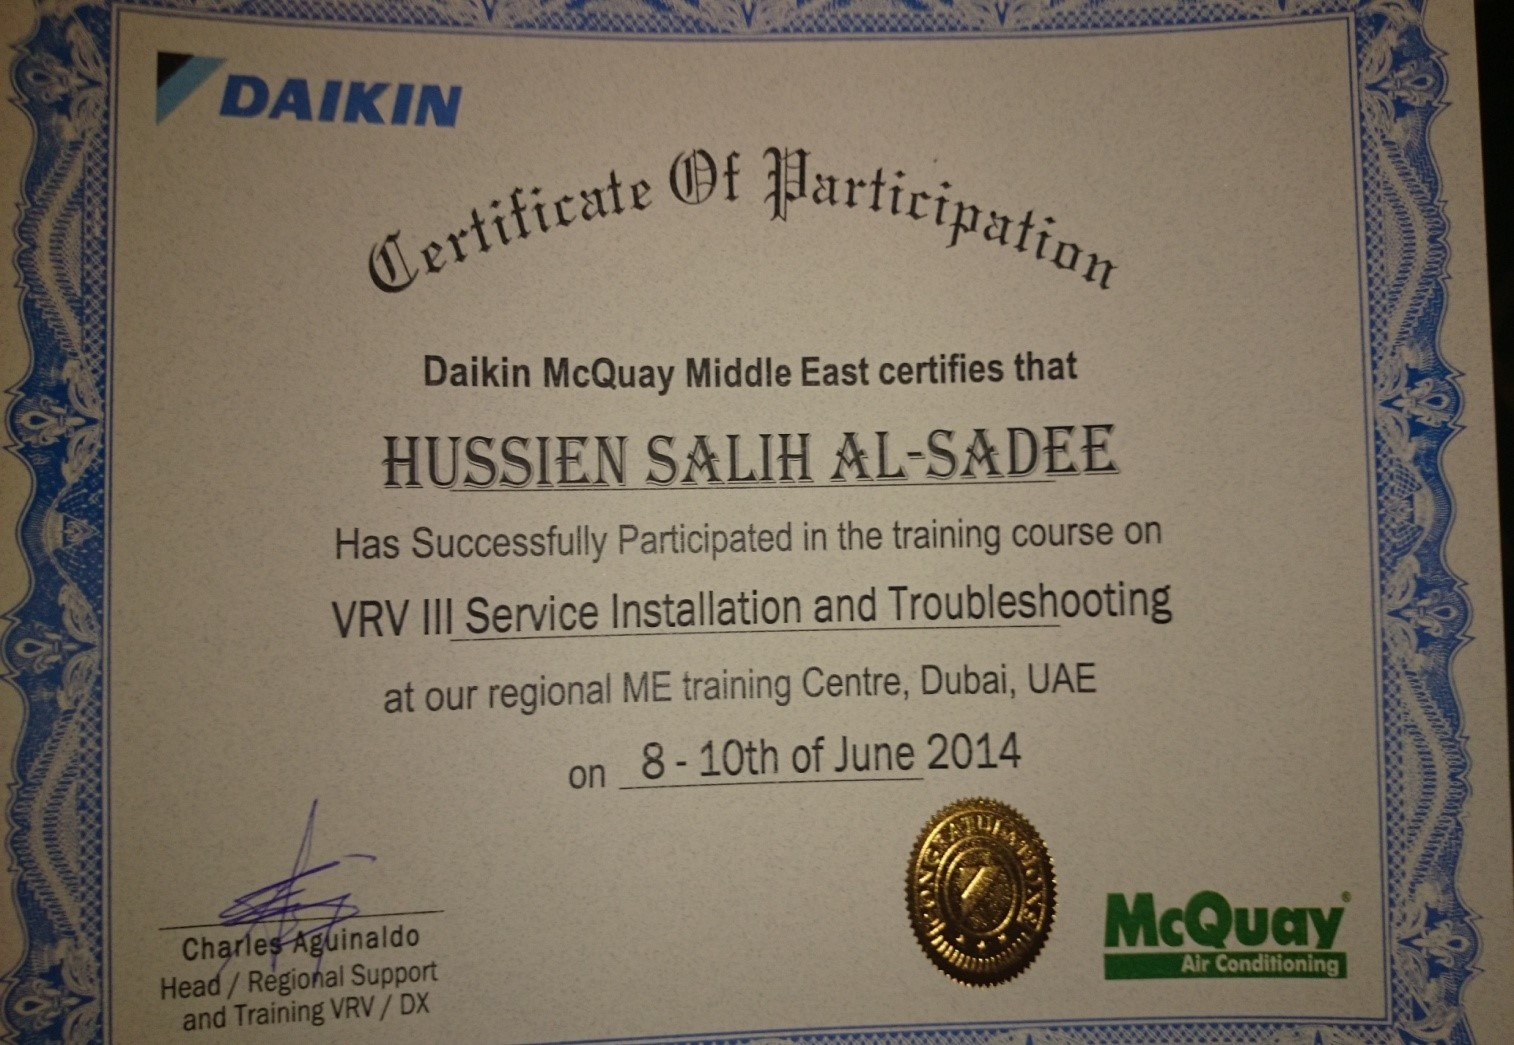 Hussien Salih AL-Sadee - Bayt.com